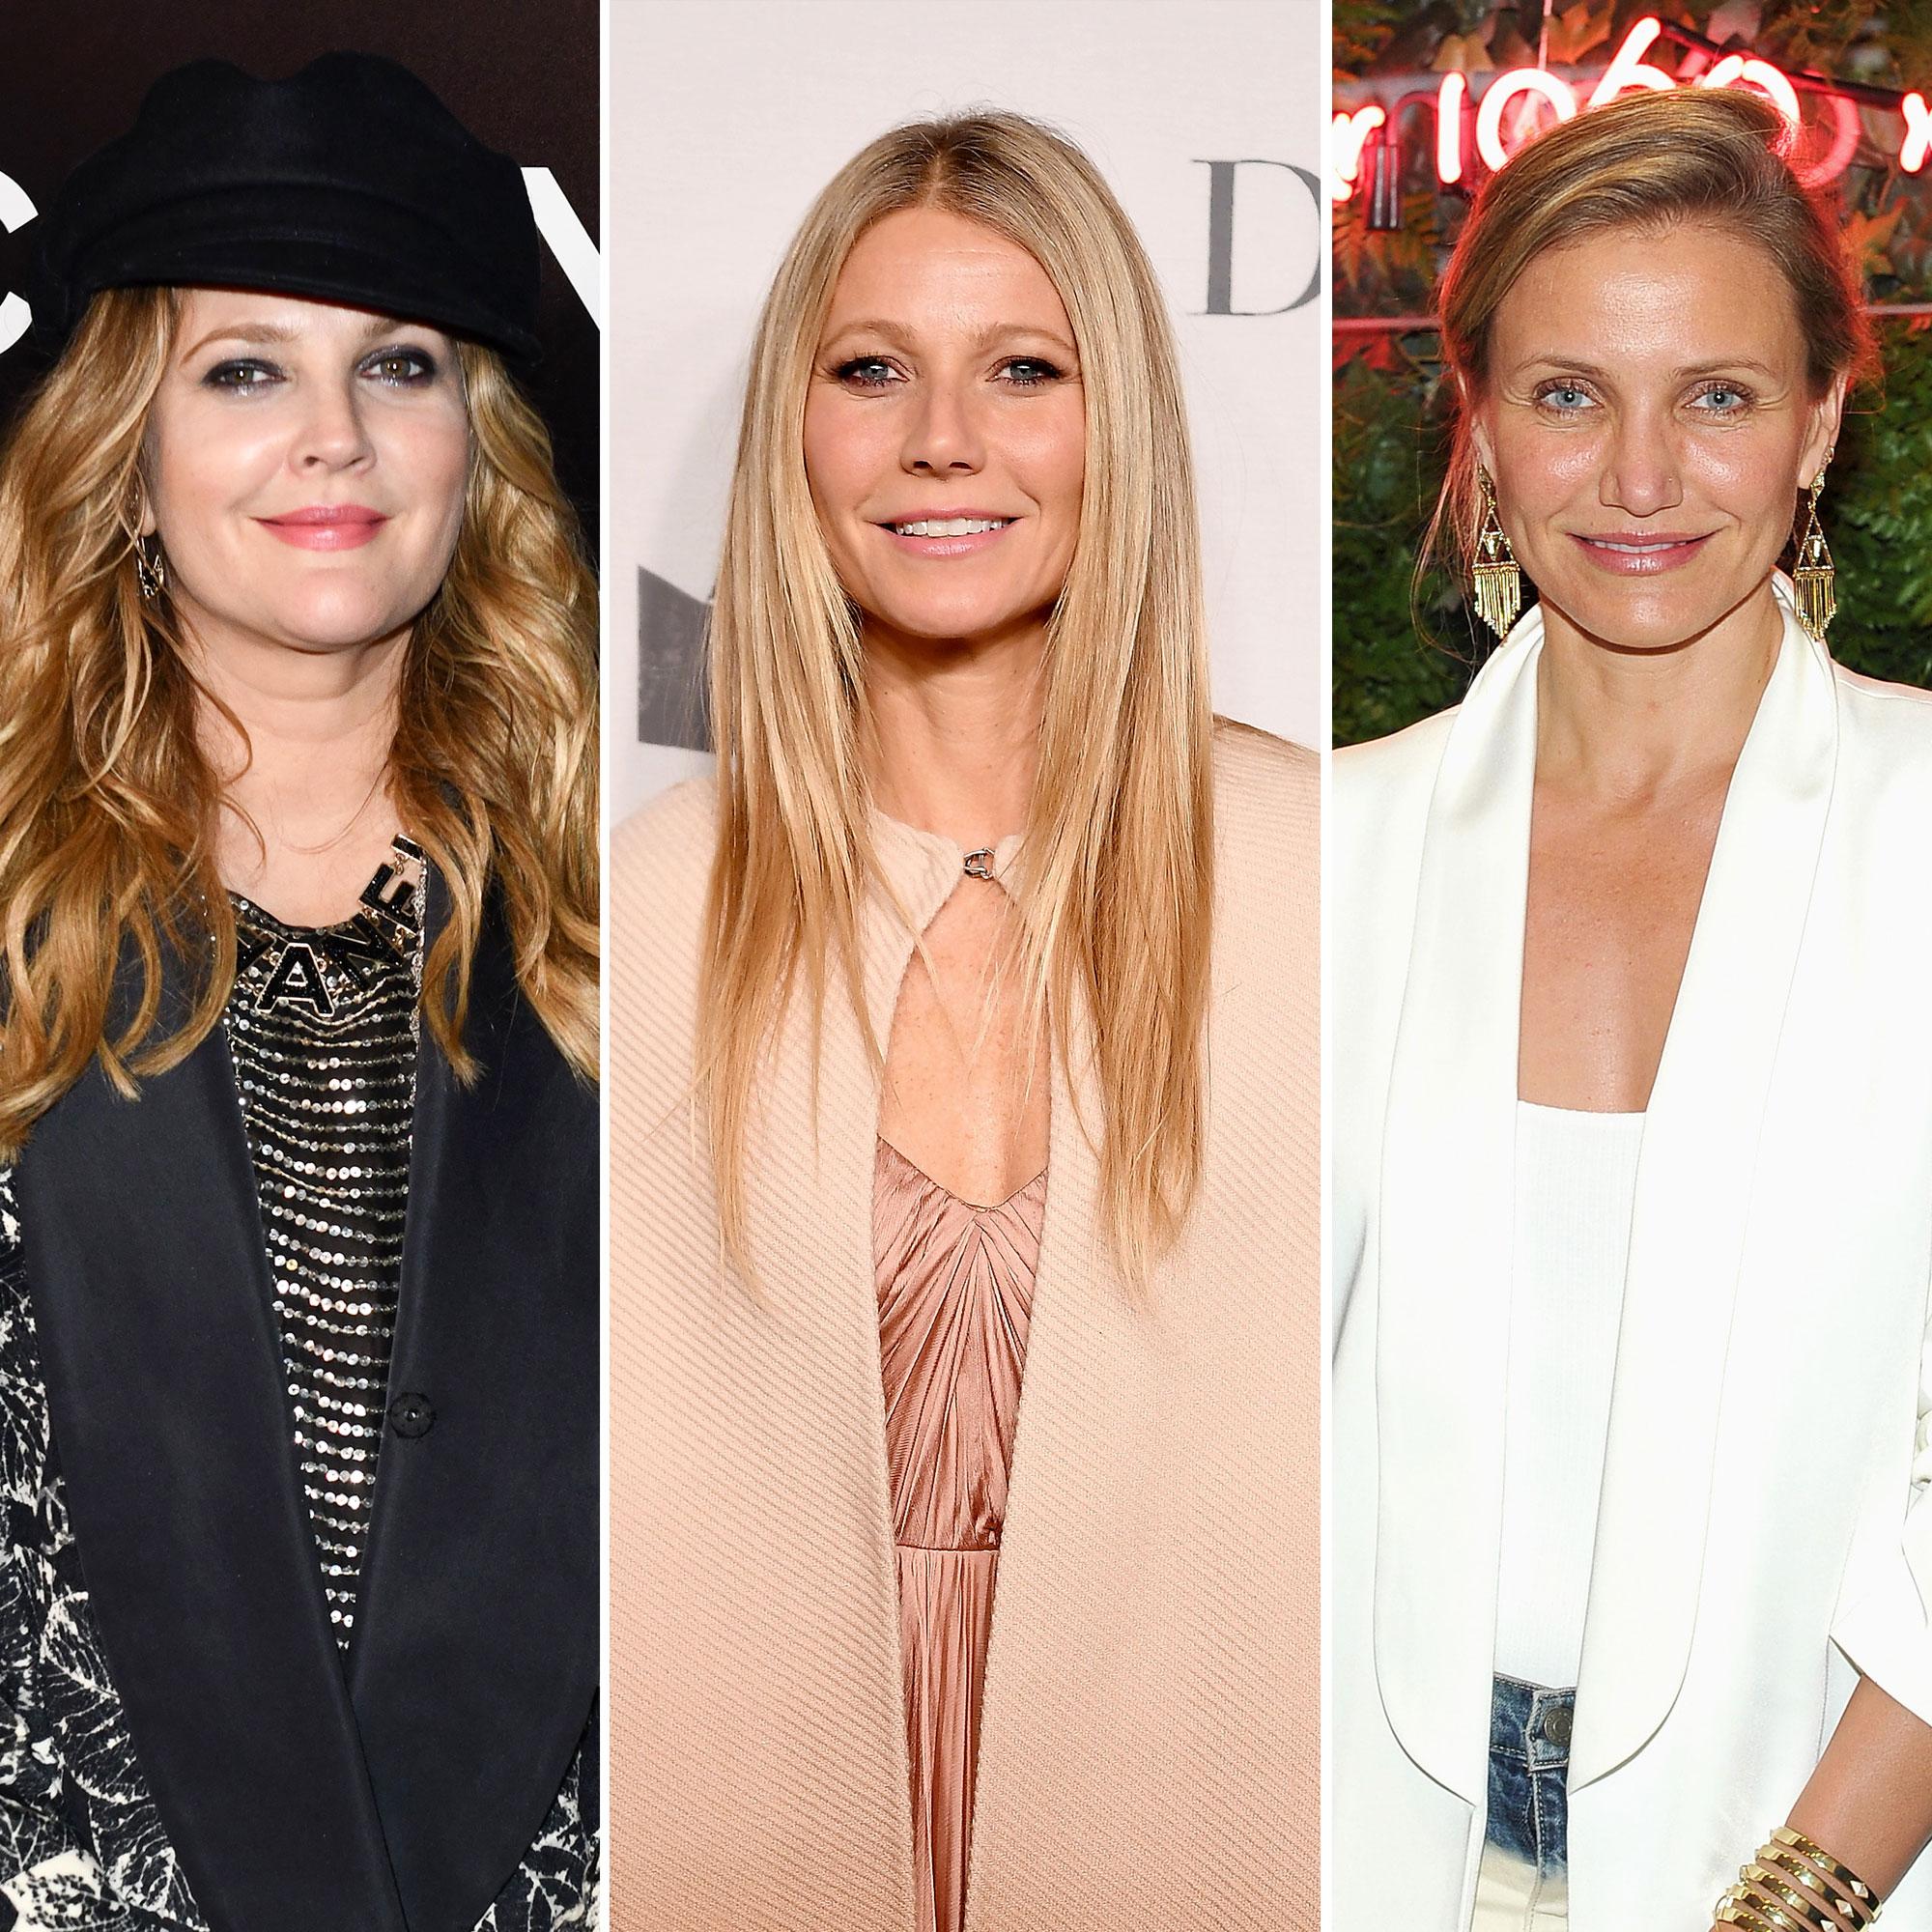 oscars 2019 Drew Barrymore Celebrates 44th Birthday With Gwyneth Paltrow and Cameron Diaz - Drew Barrymore, Gwyneth Paltrow, and Cameron Diaz